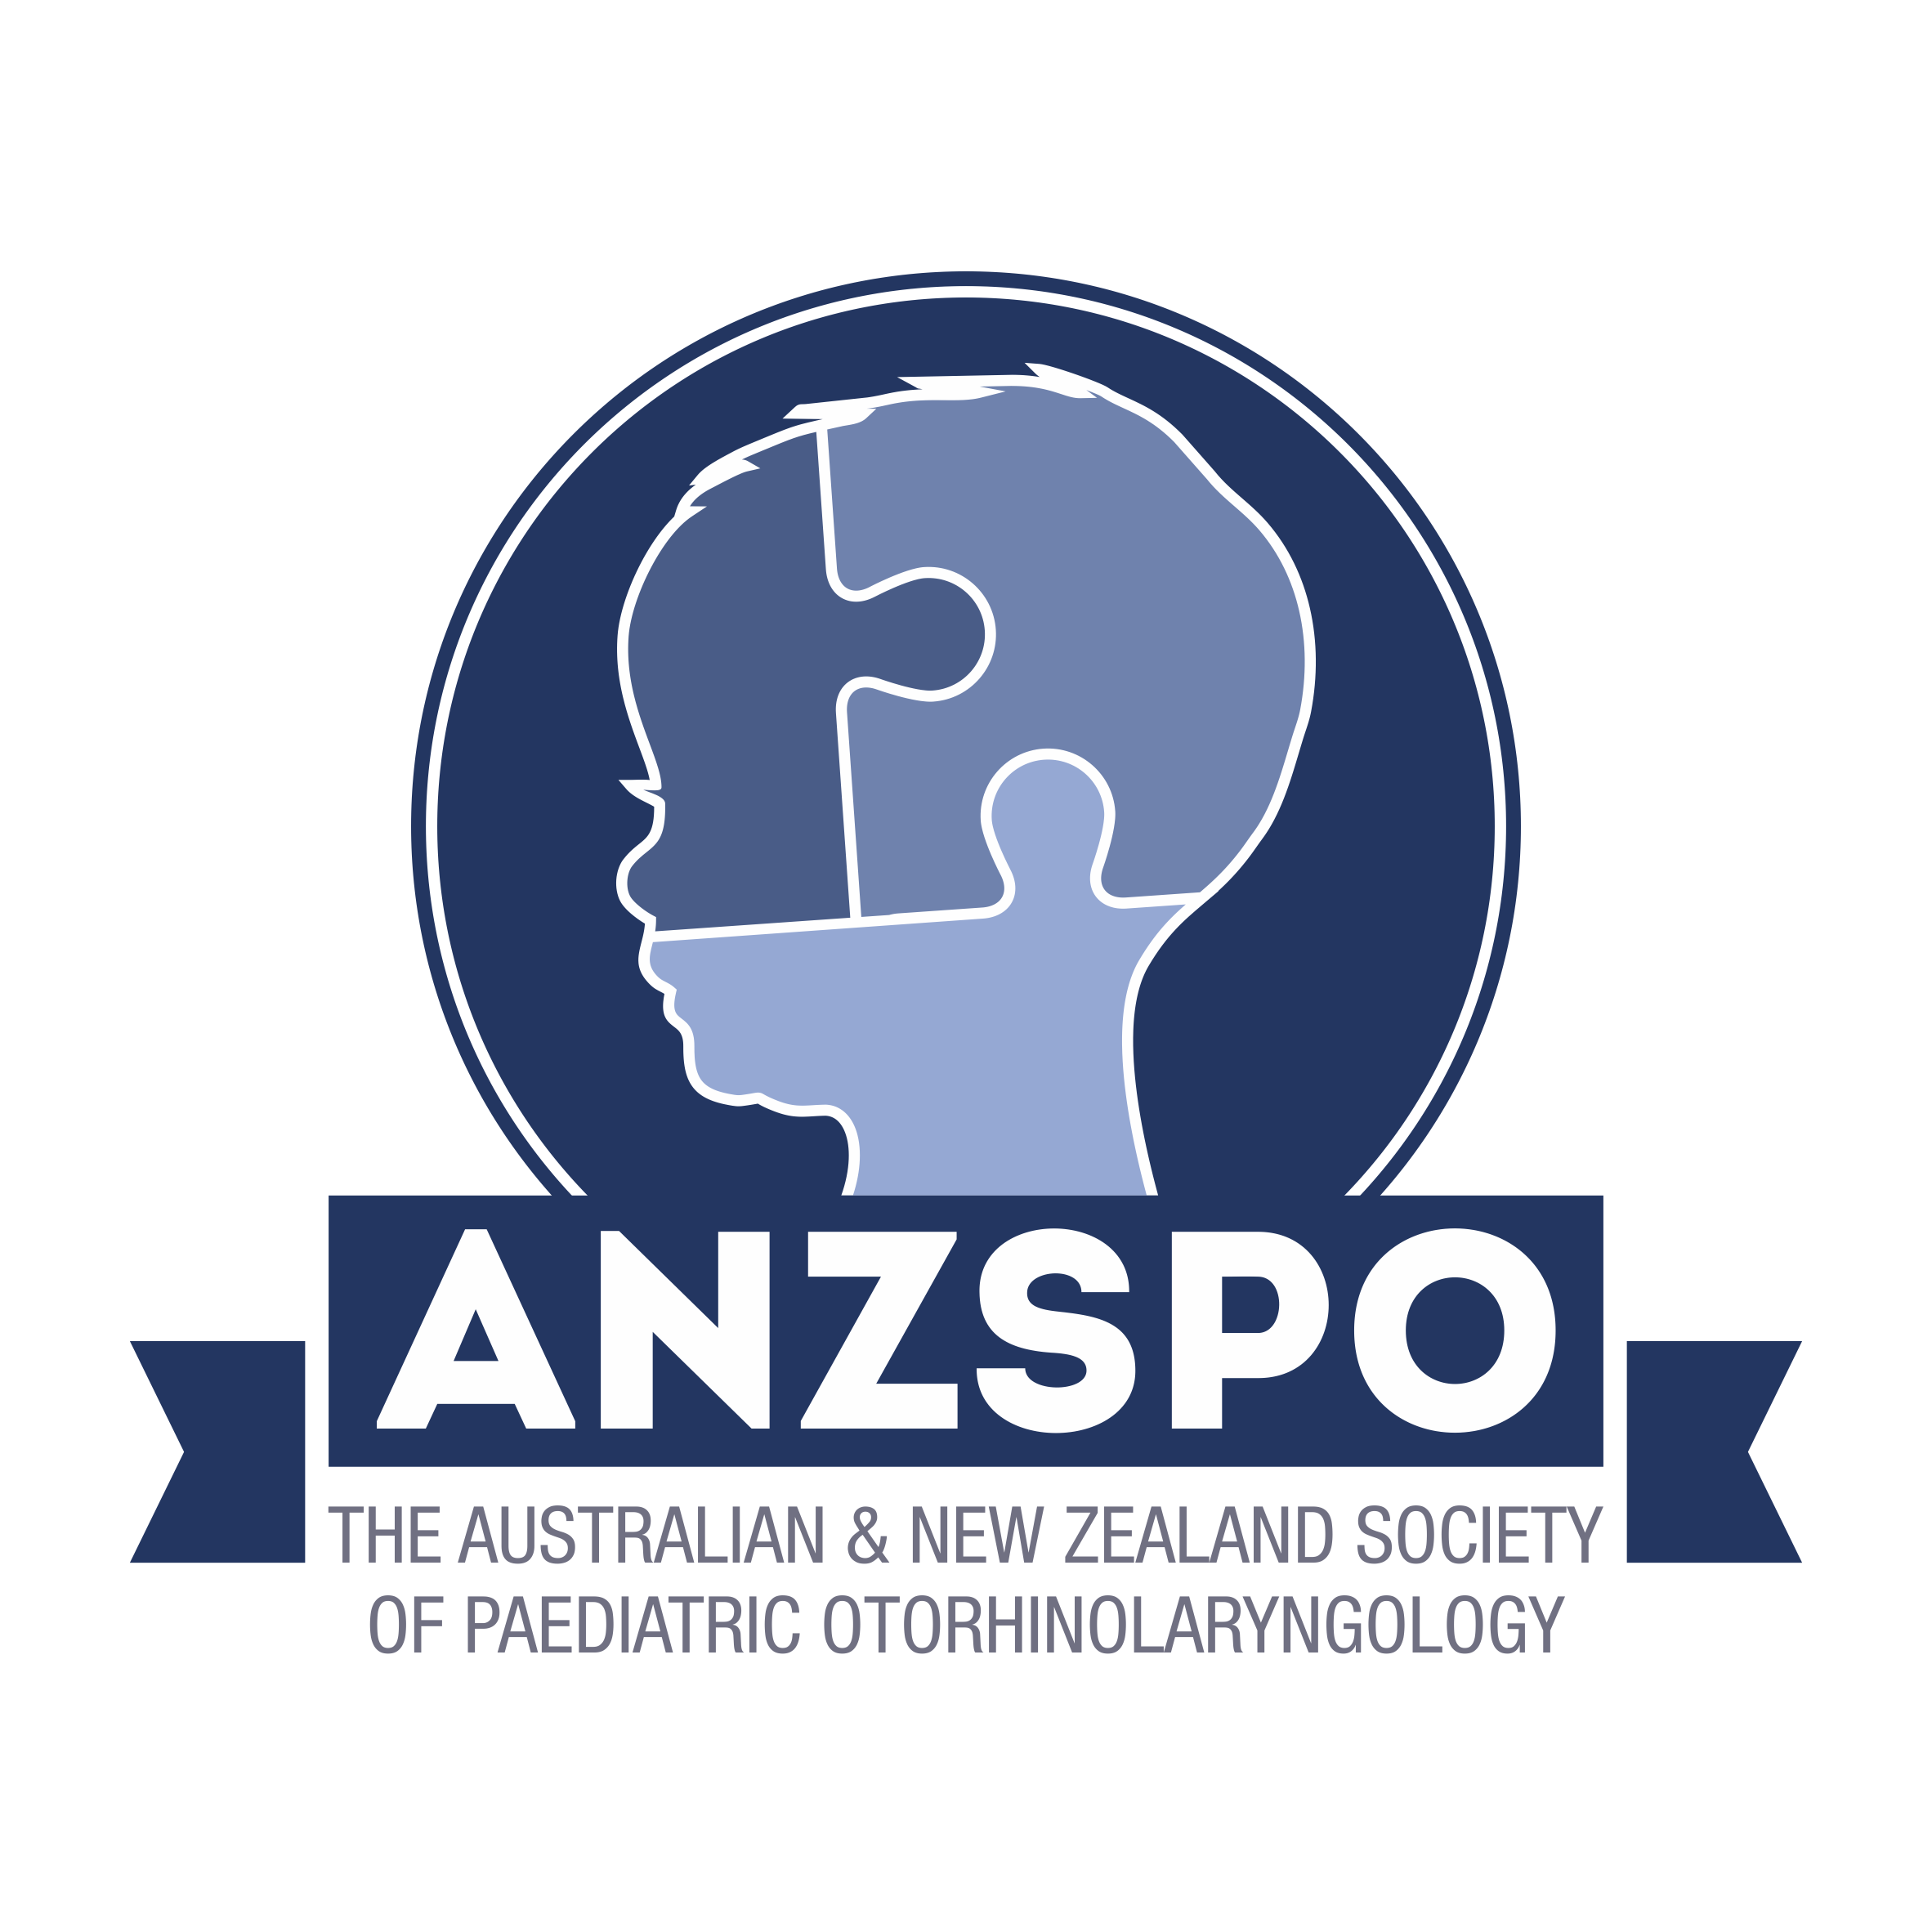 Australian New Zealand Society of Paediatric Otorhinolaryngology